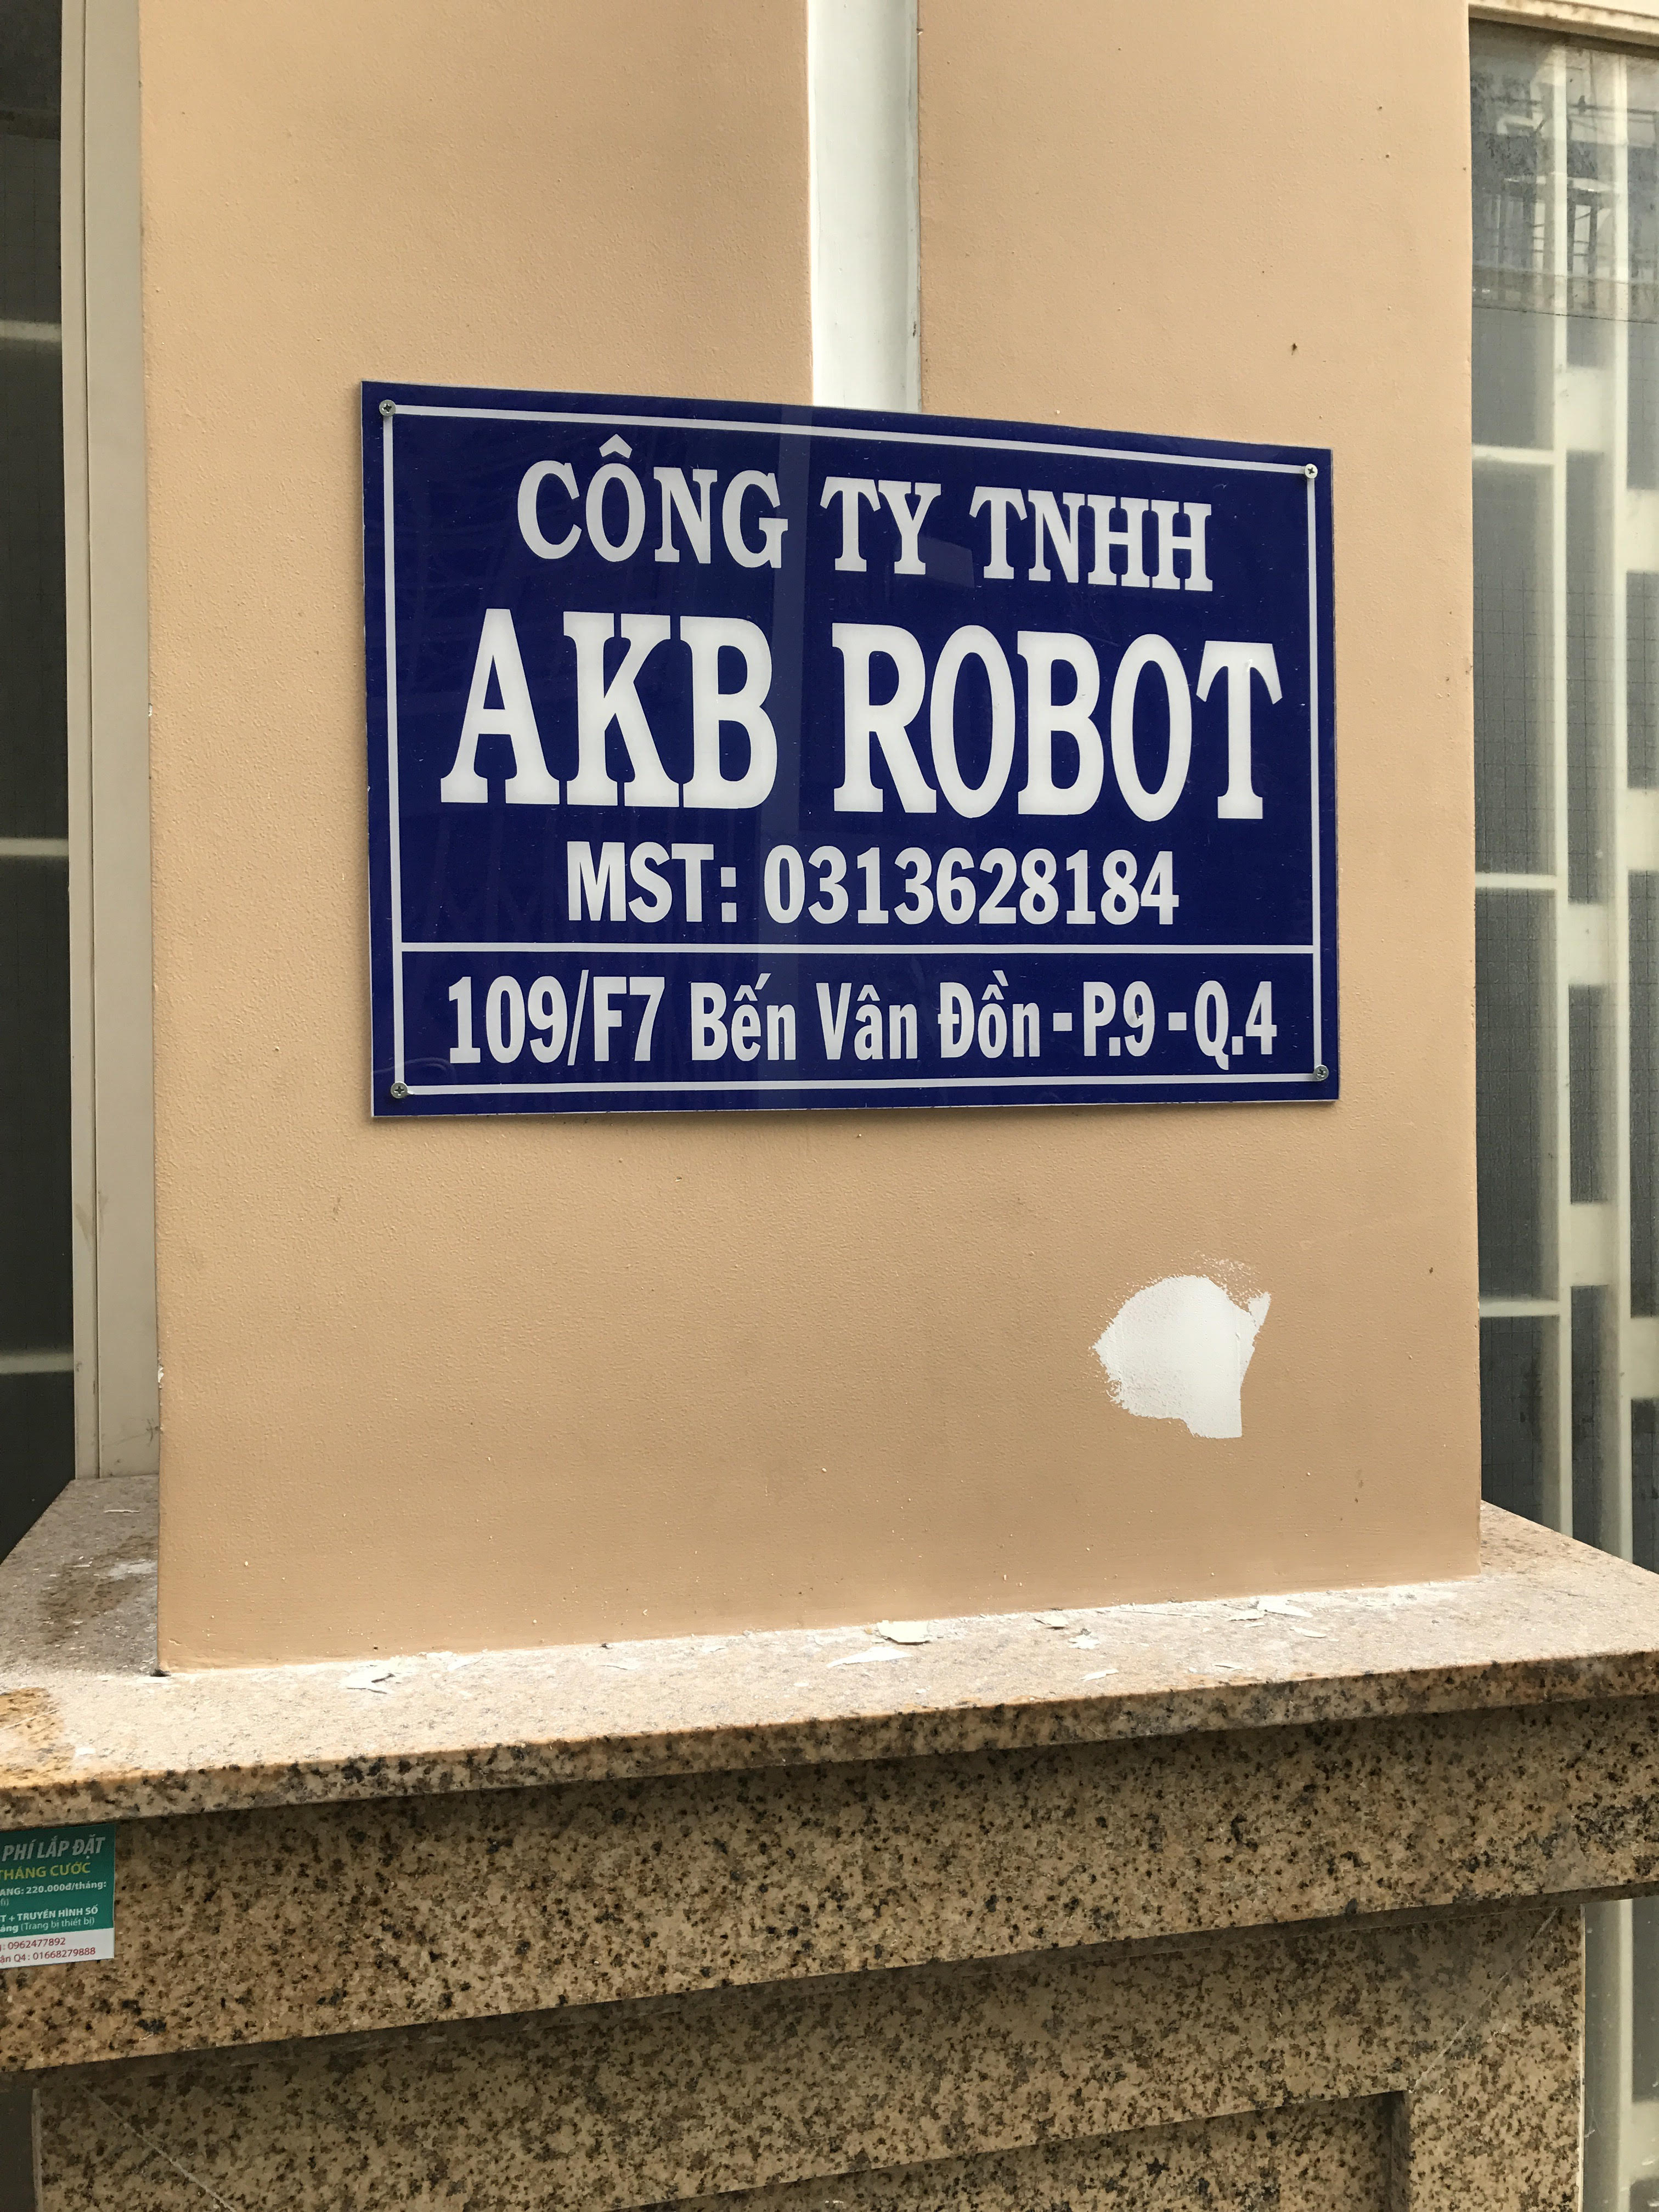 cong ty akb robot